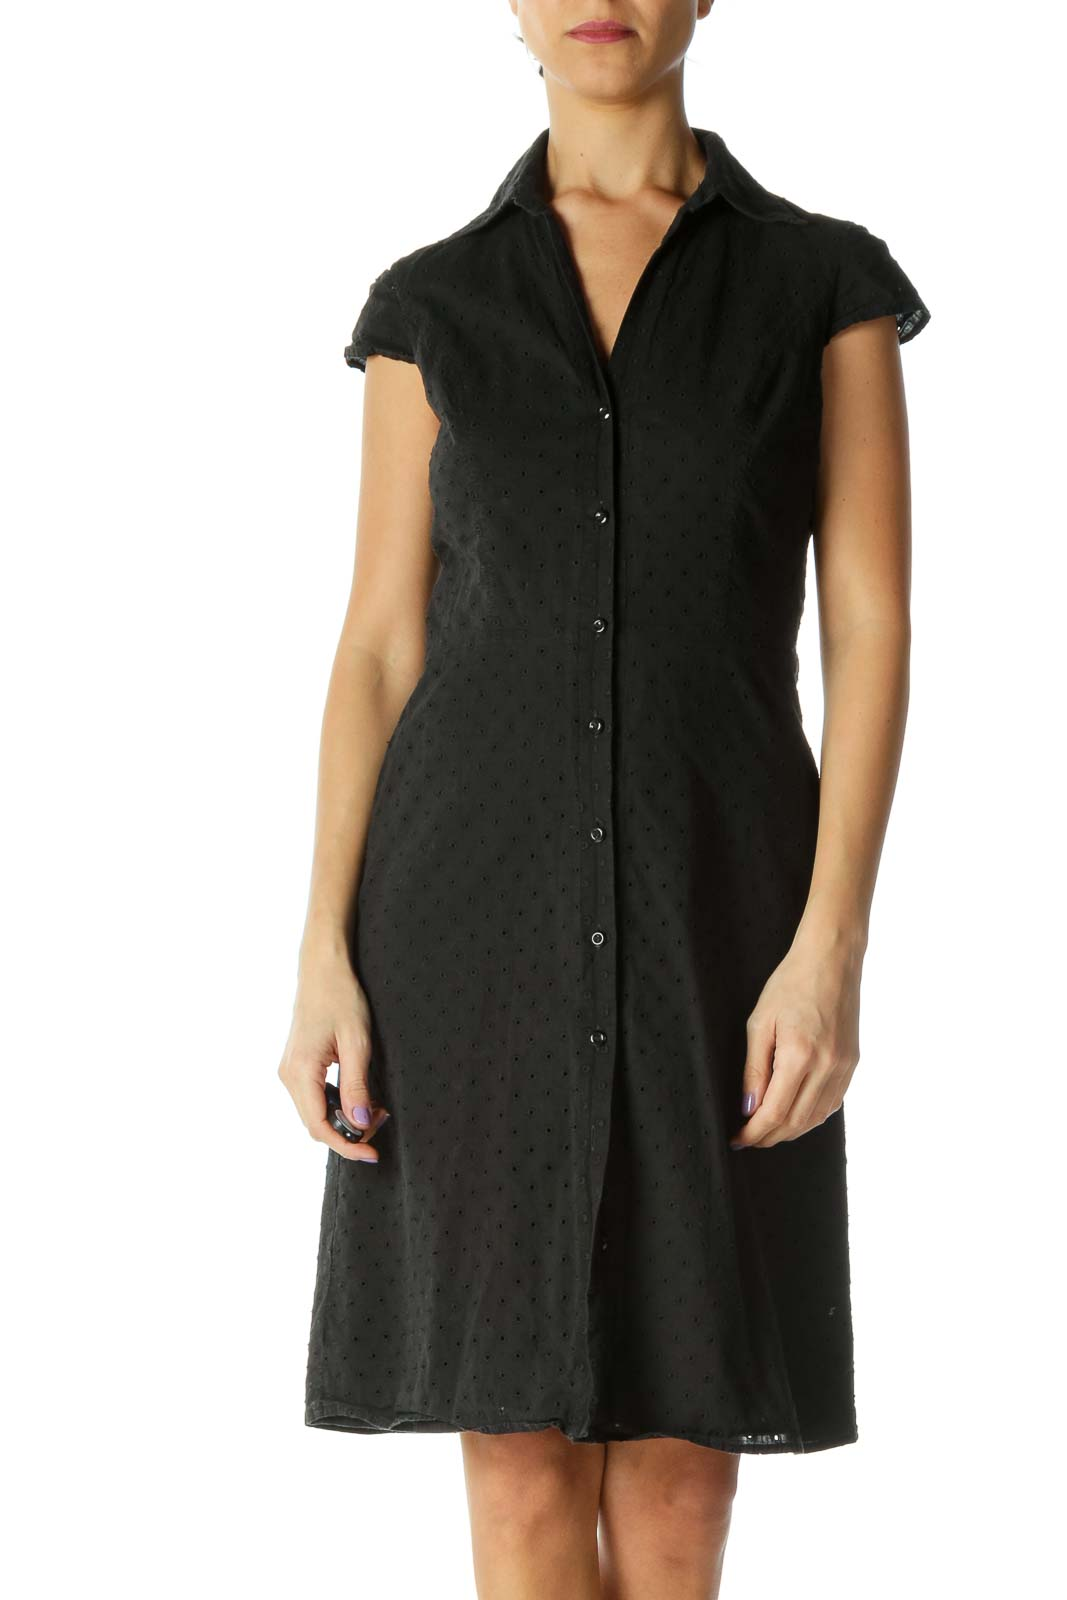 Black Solid A-Line Dress